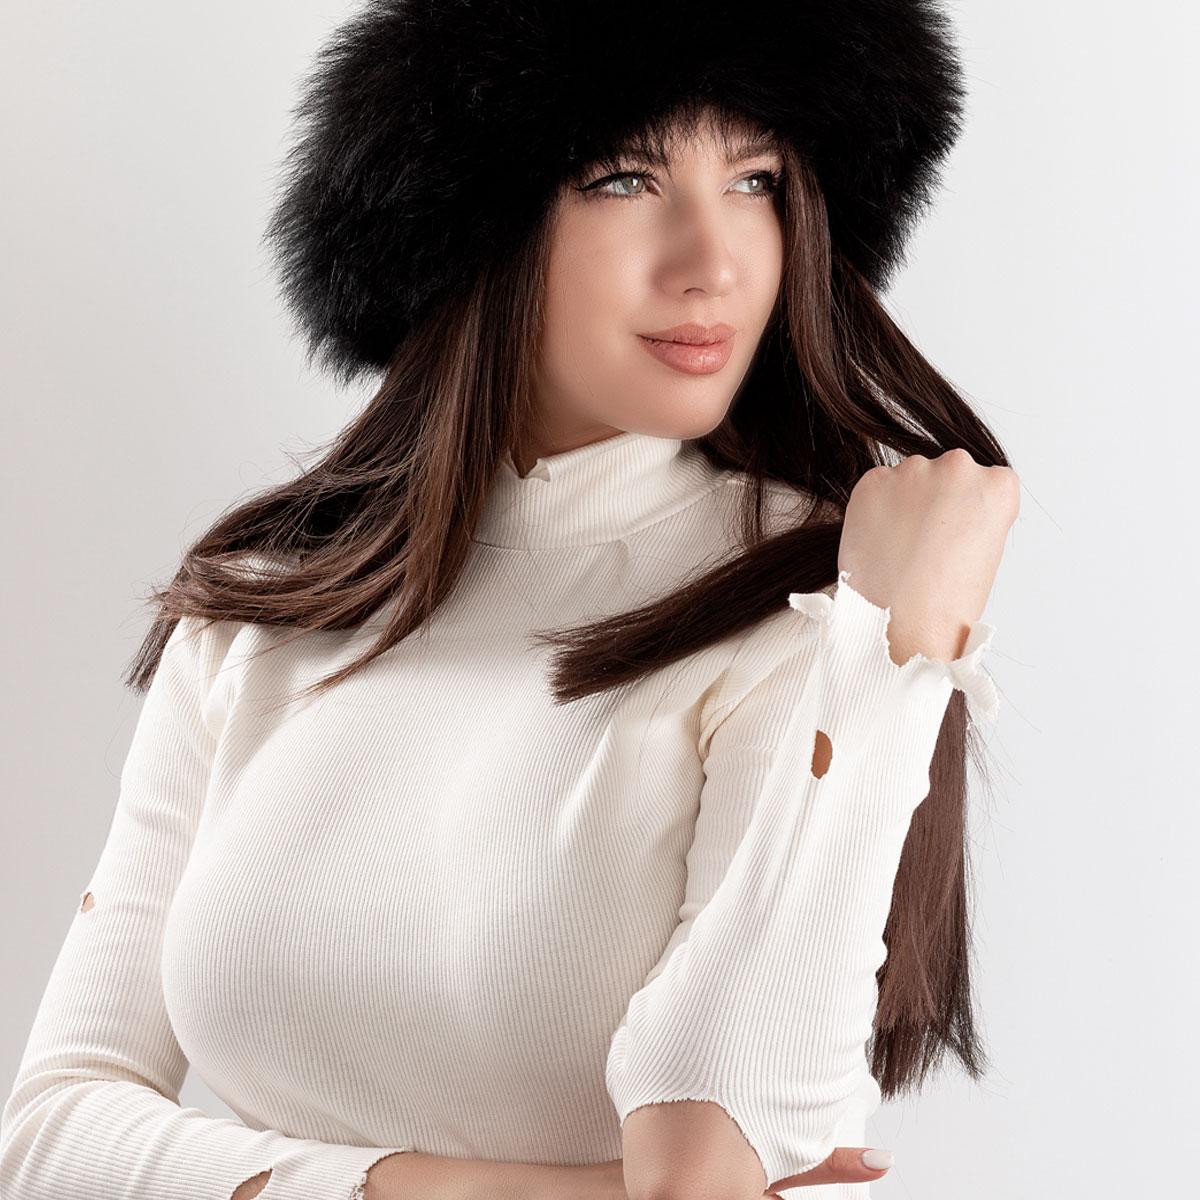 Fashion Photograpy